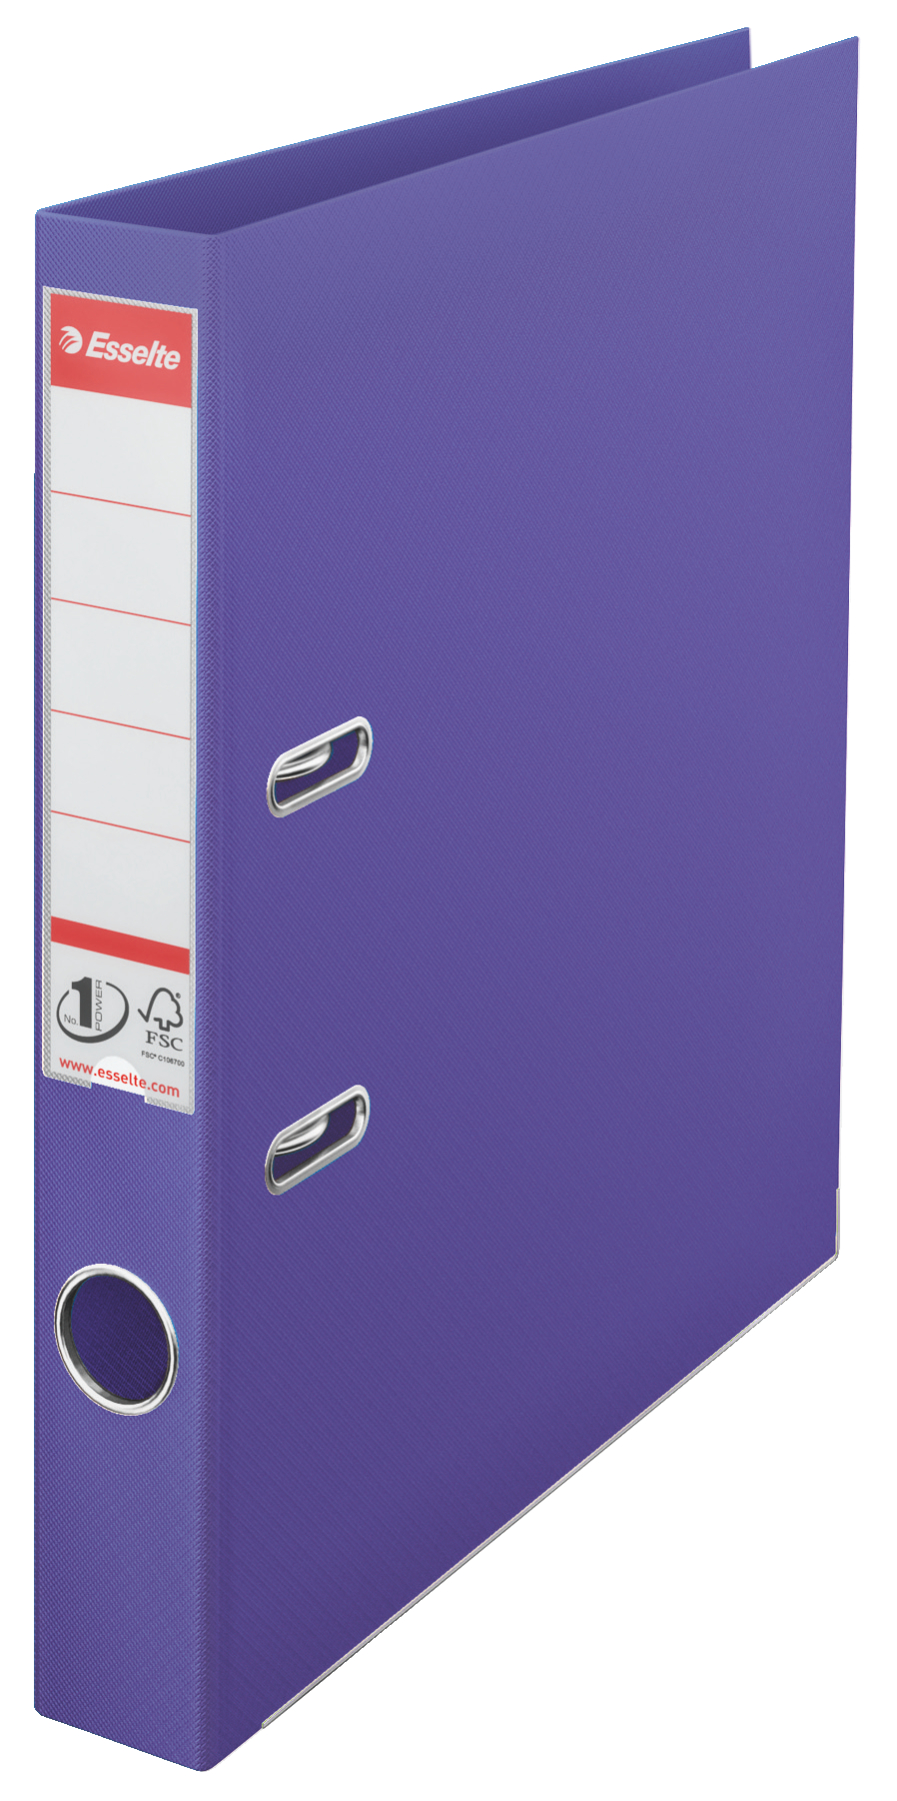 Esselte No.1 Power Lever Arch File A4 PP 50mm Violet  PK10